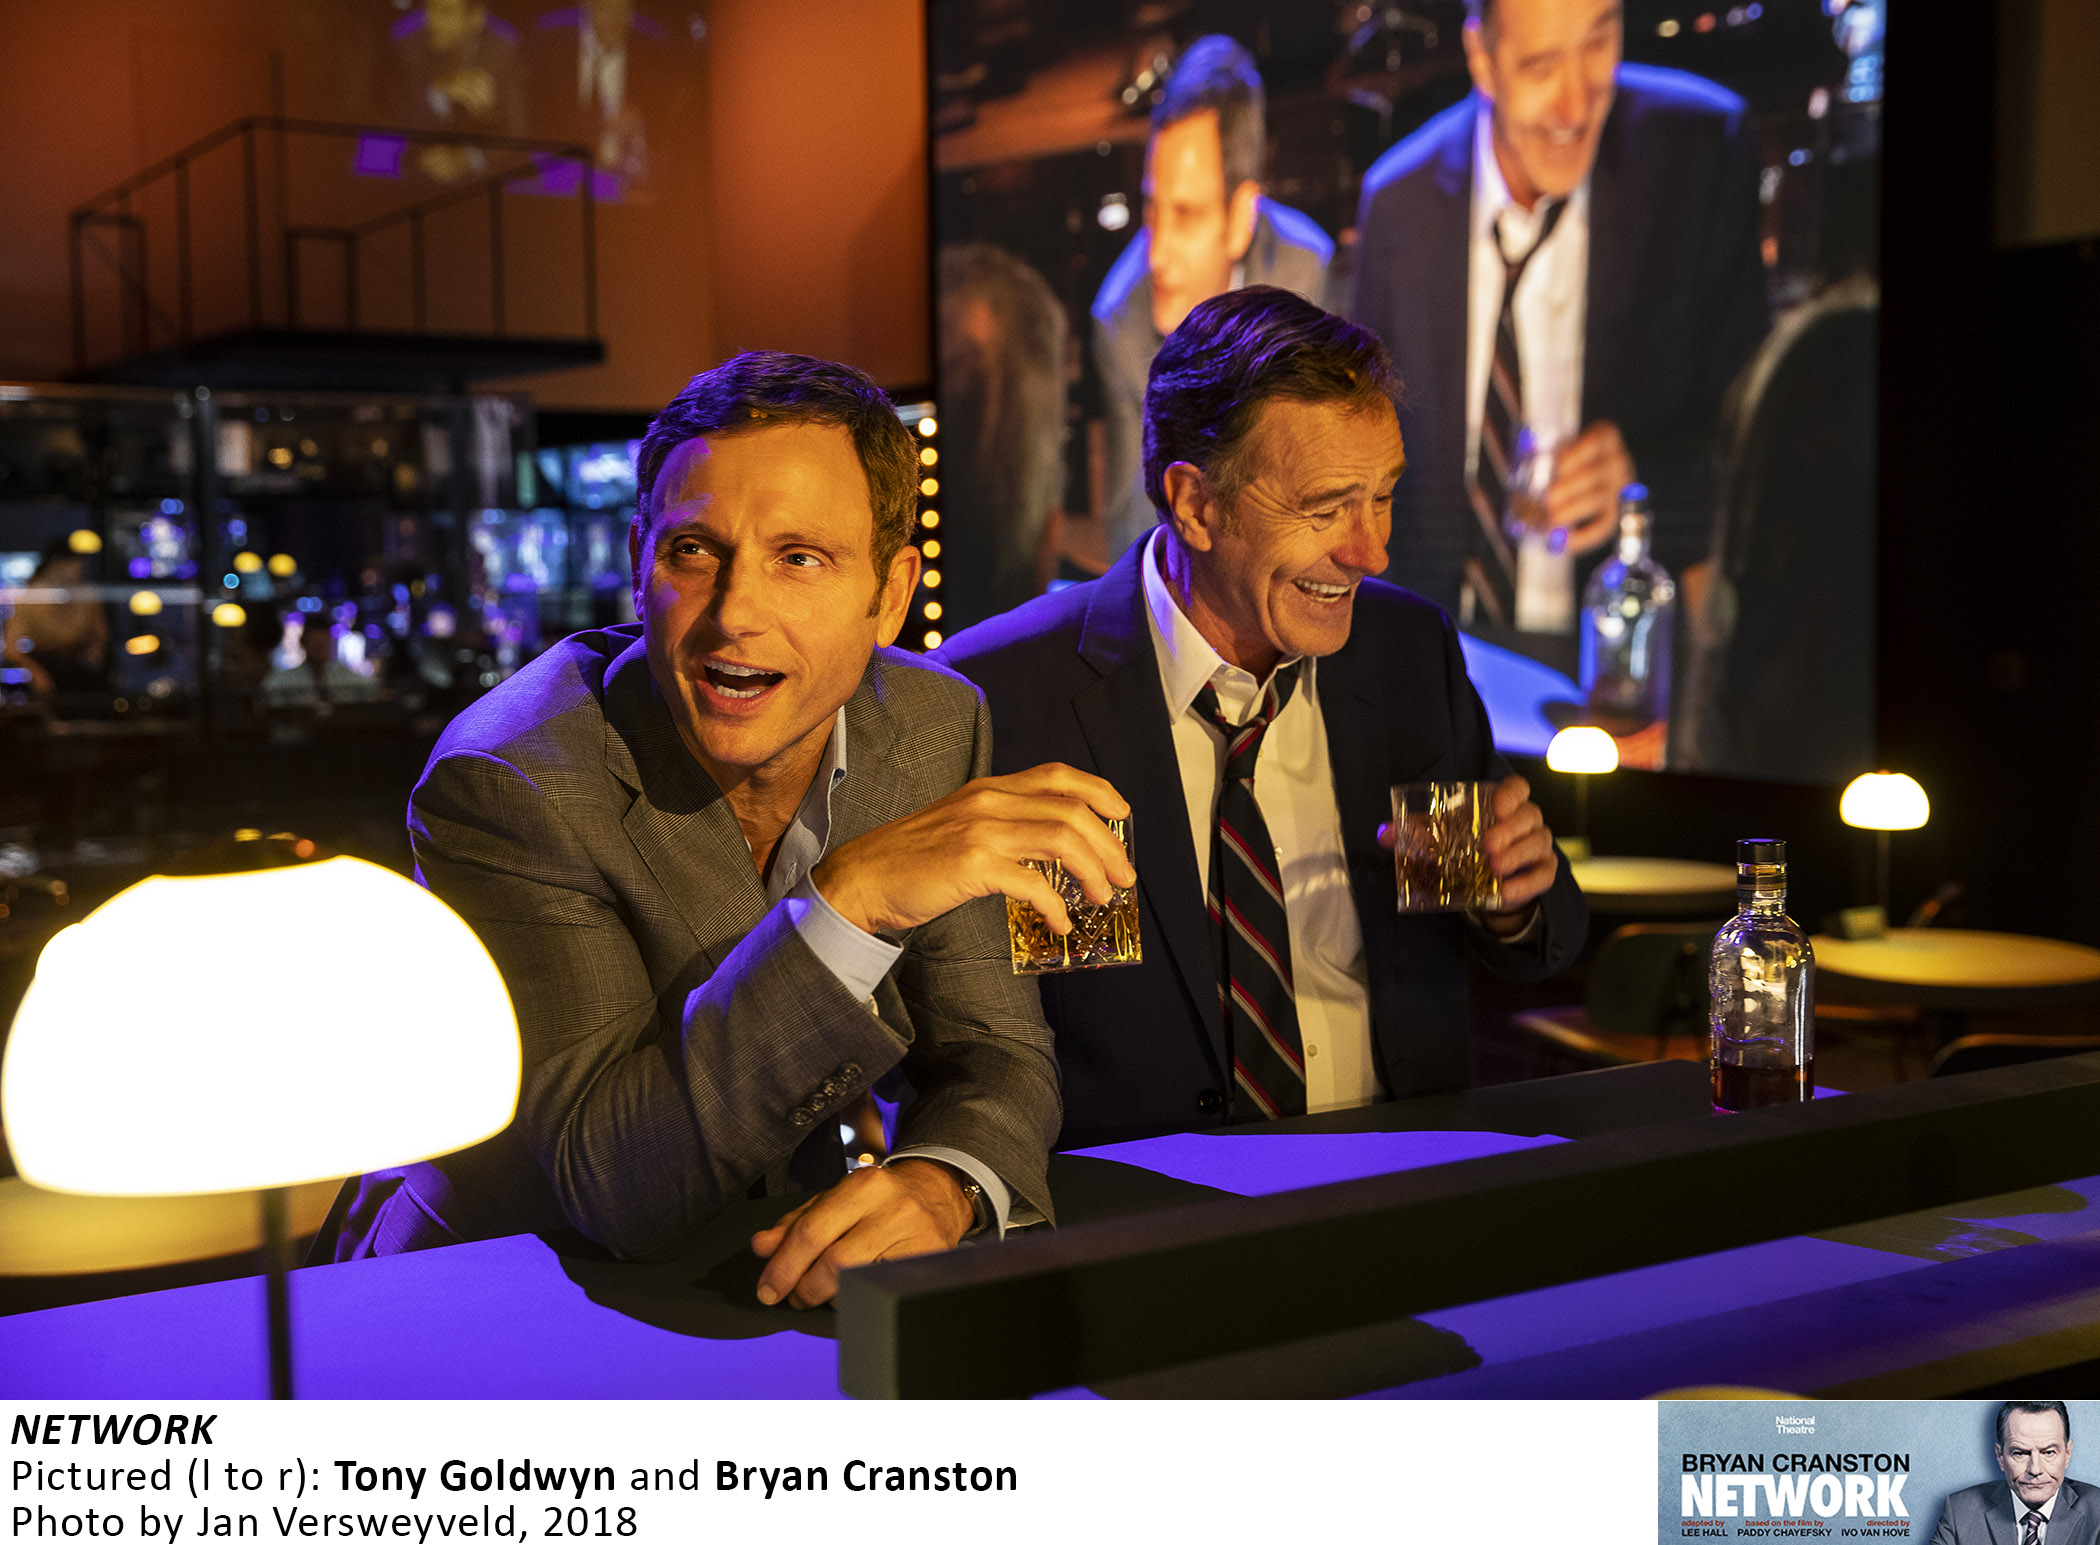 8465_Tony Goldwyn and Bryan Cranston in NETWORK, Photo by Jan Versweyveld, 2018.jpg